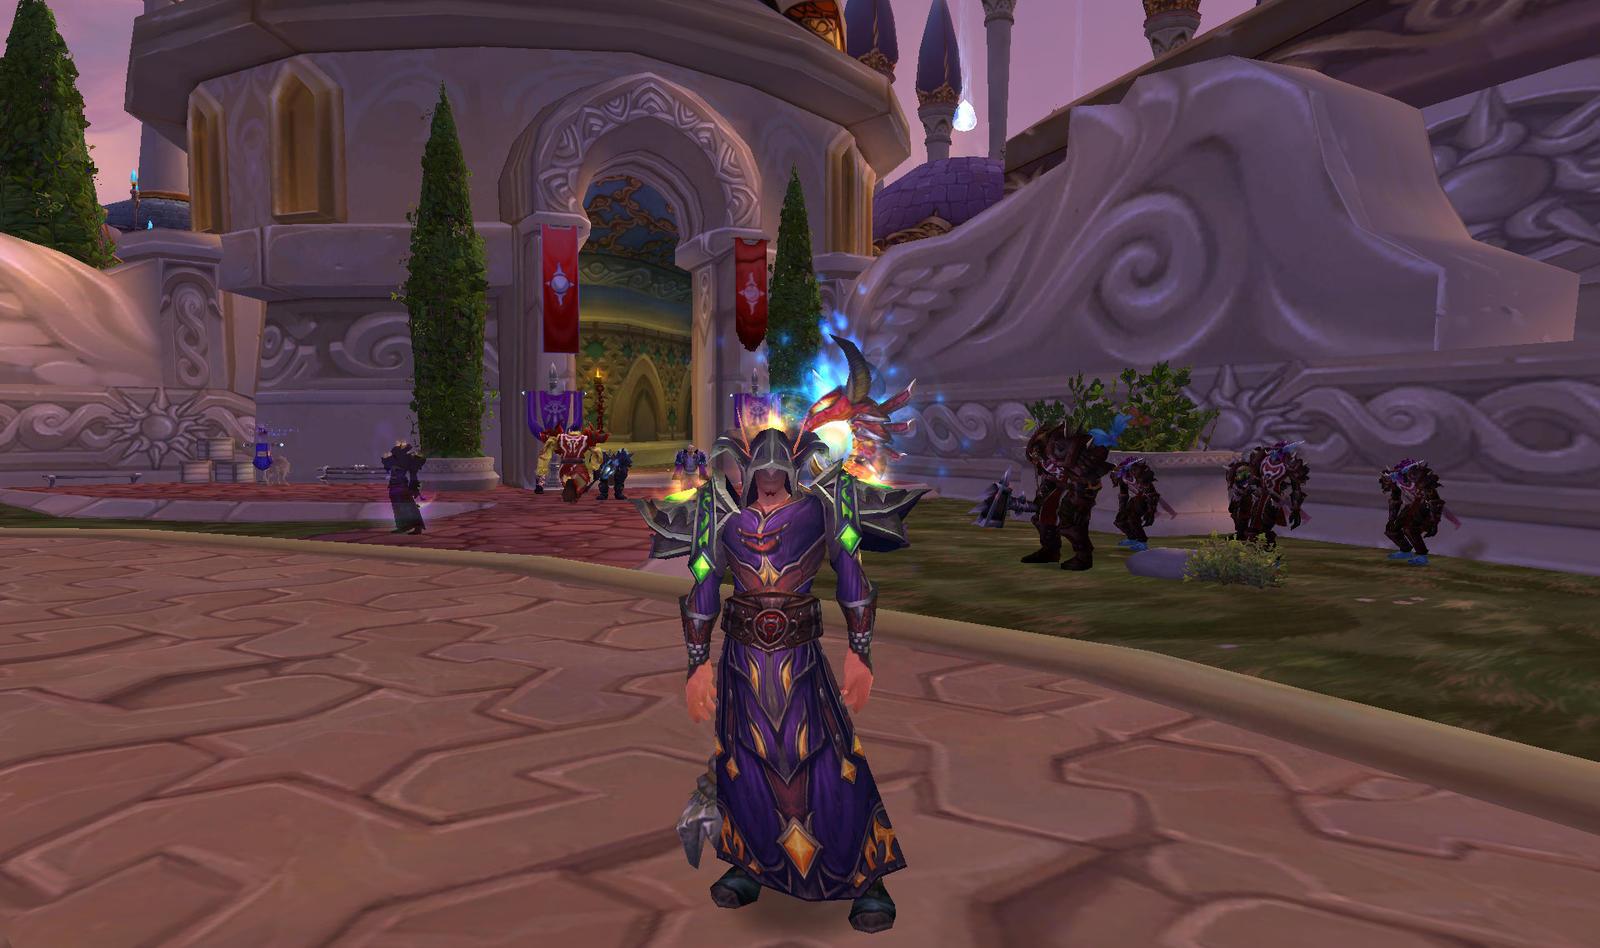 Me, Blood Elf Shadow Priest by Filanwizard on DeviantArt